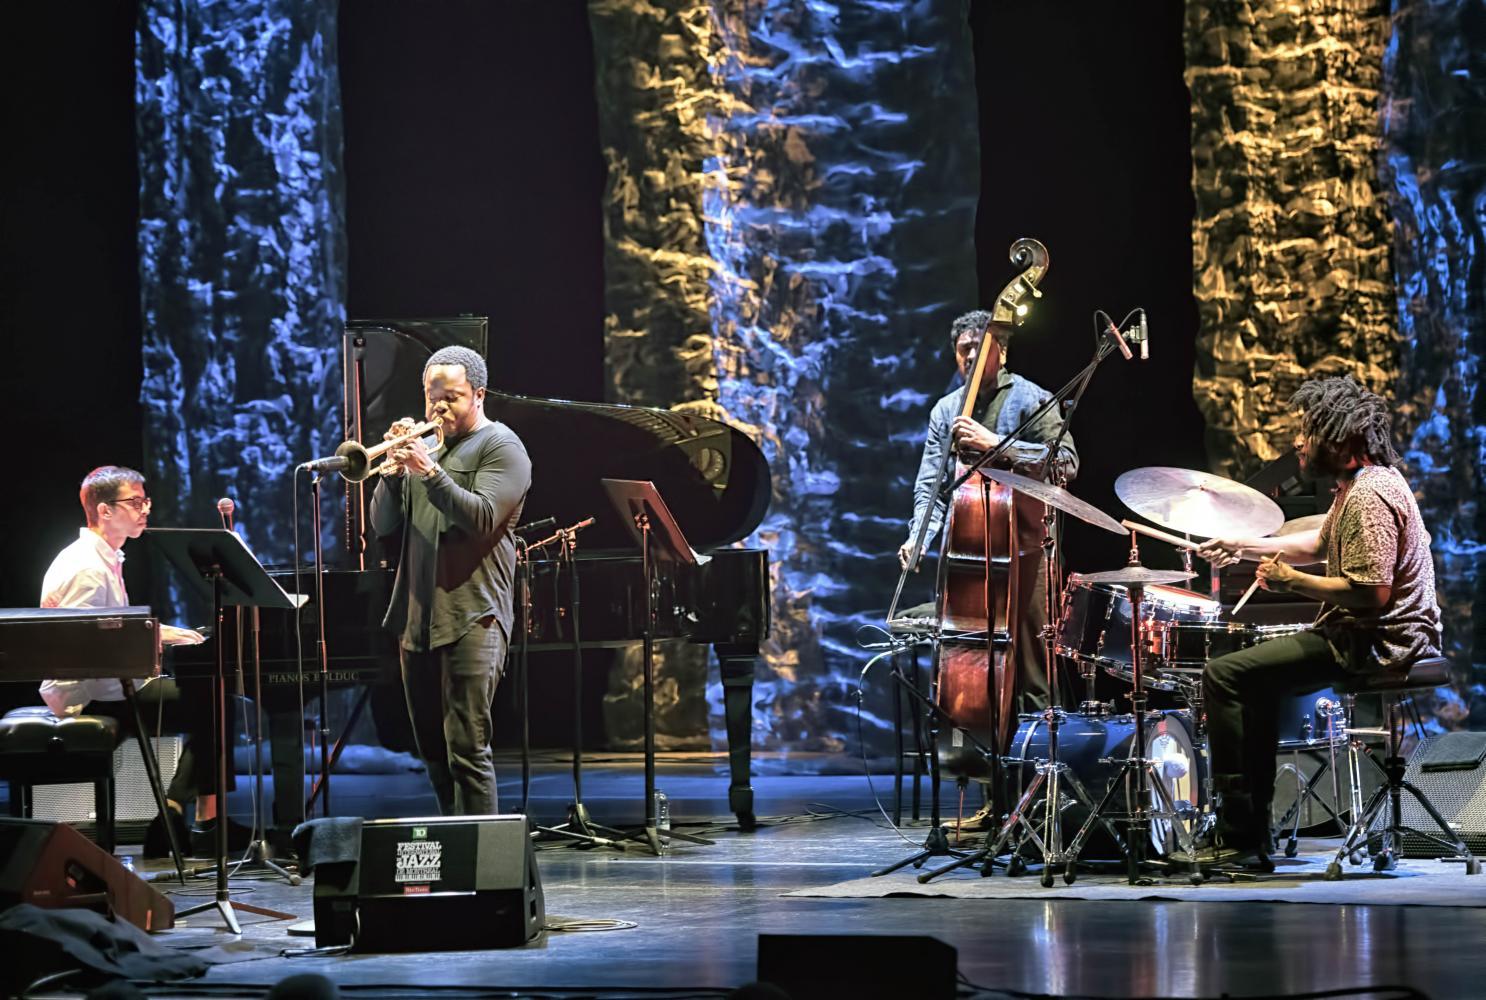 Sam Harris, Ambrose Akinmusire, Harish Raghavan and Justin Brown with the Ambrose Akinmusire Quartet at The Montreal International Jazz Festival 2017